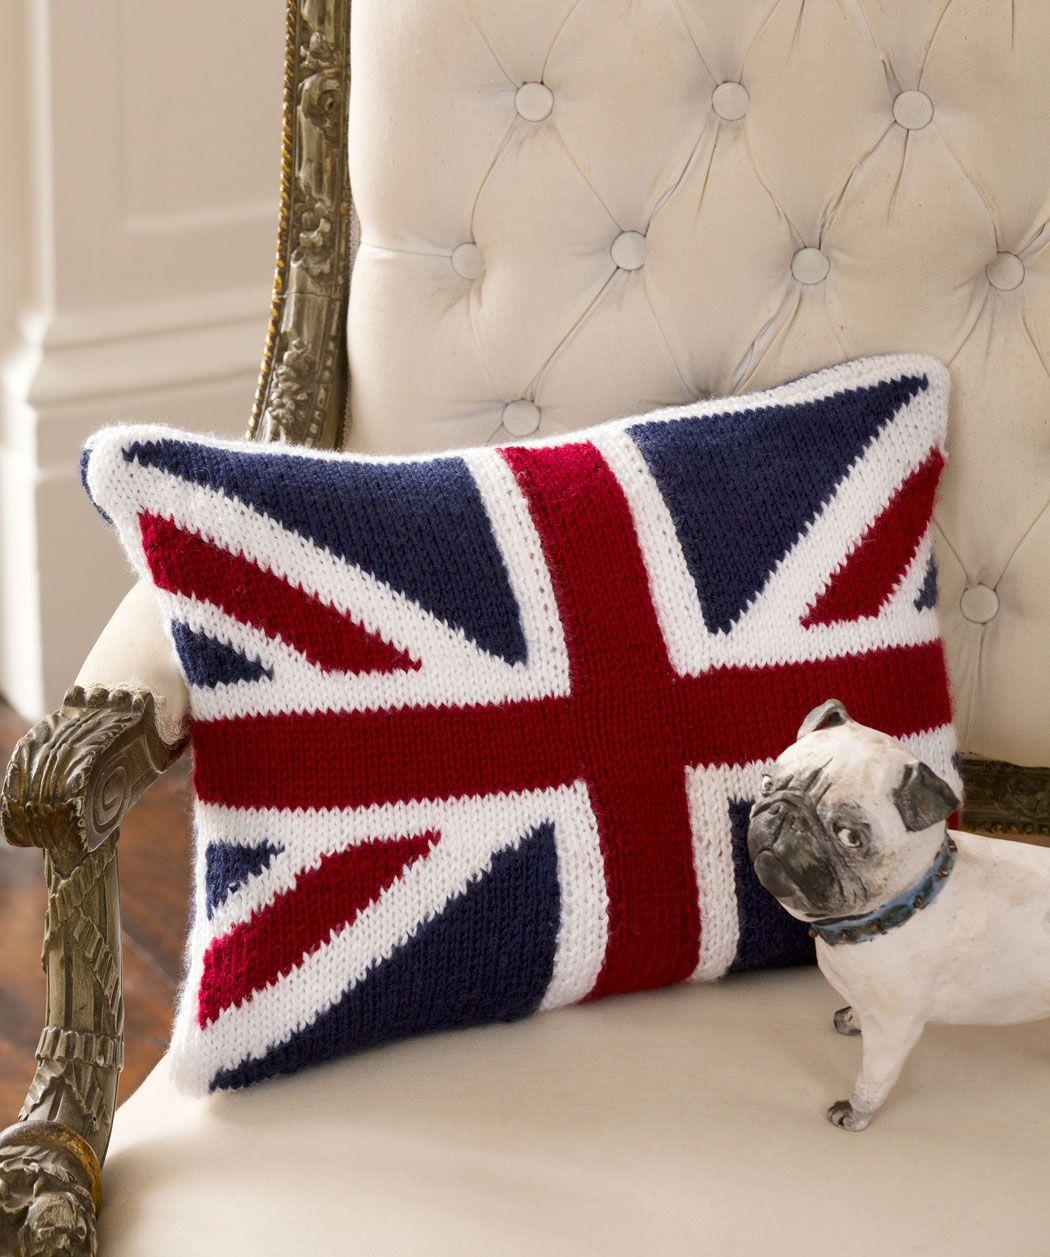 Union Jack Pillow Knitting Pattern | Red Heart freebie, thanks so ...